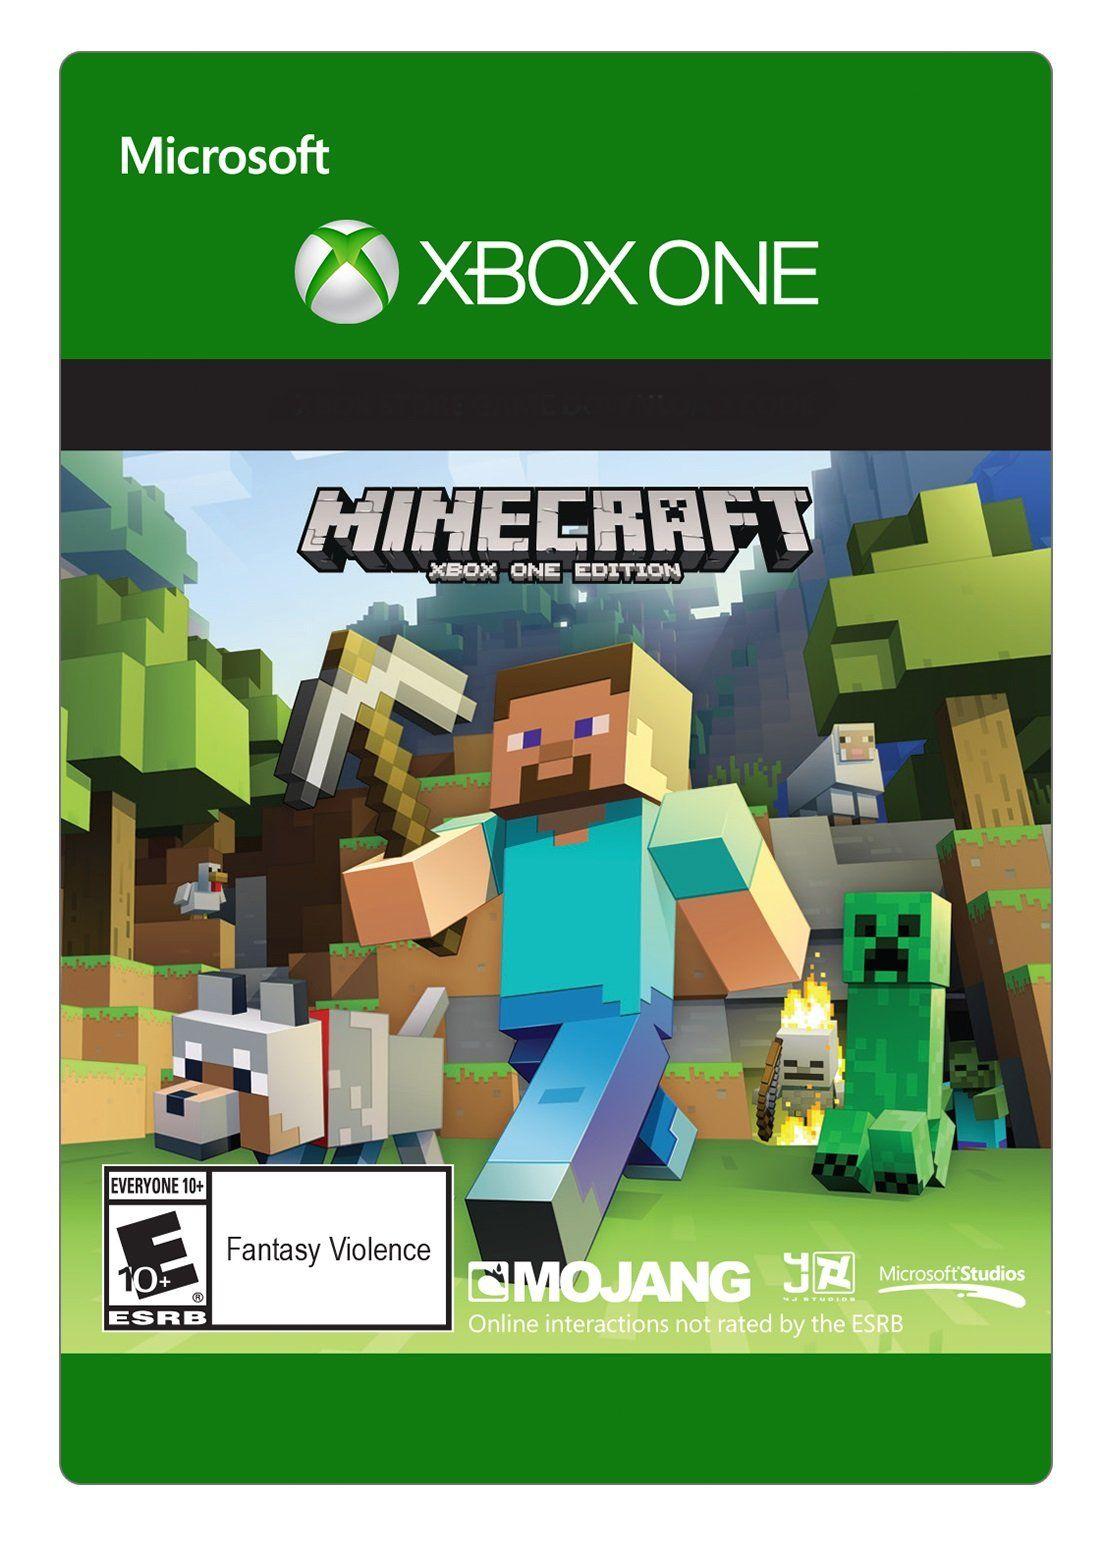 Amazon.com: Minecraft: Xbox One Edition - Xbox One [Digital Code